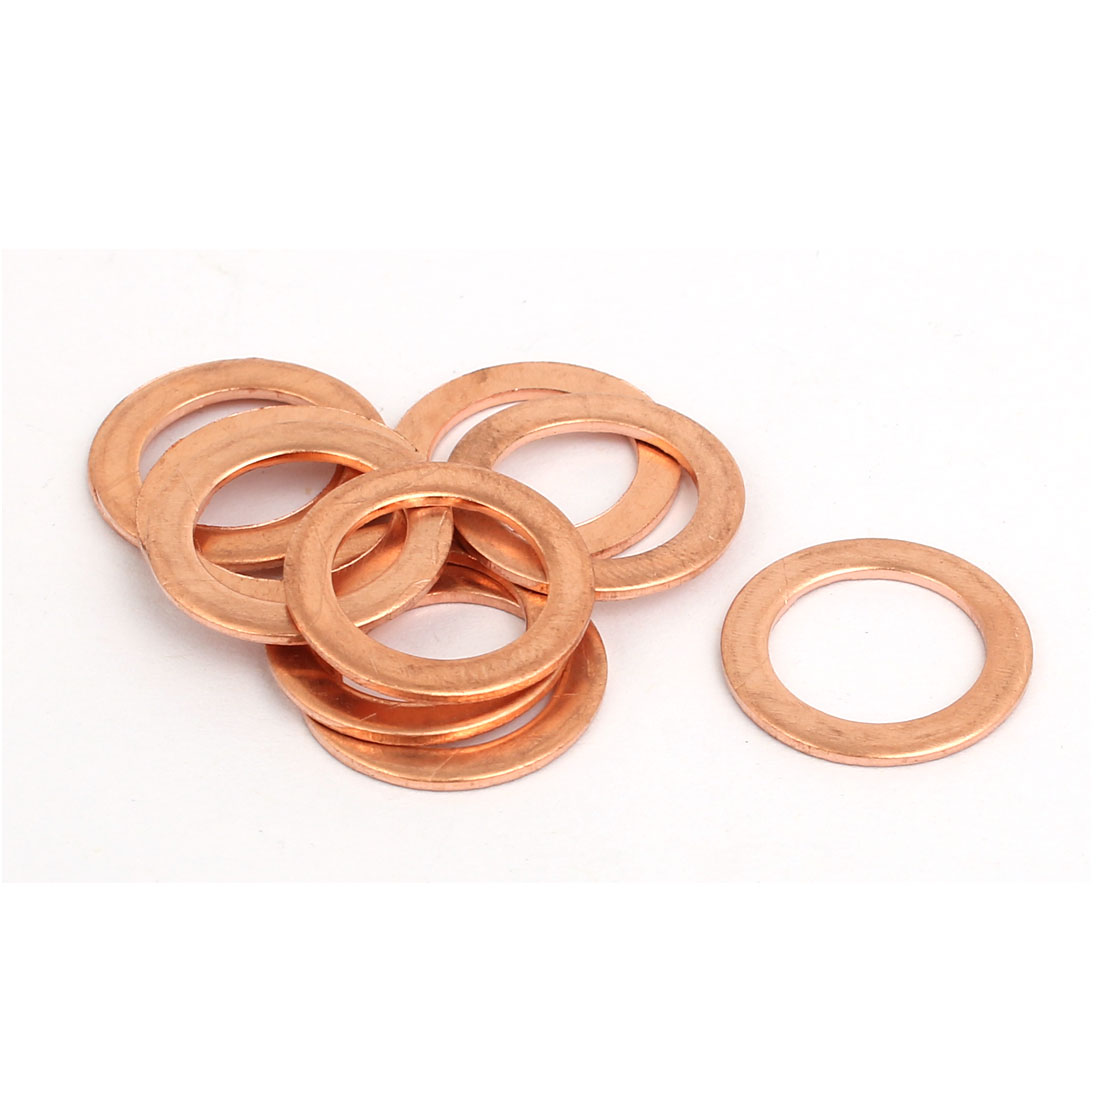 10pcs 12mmx18mmx1mm Copper Flat Ring Sealing Crush Washer Gasket